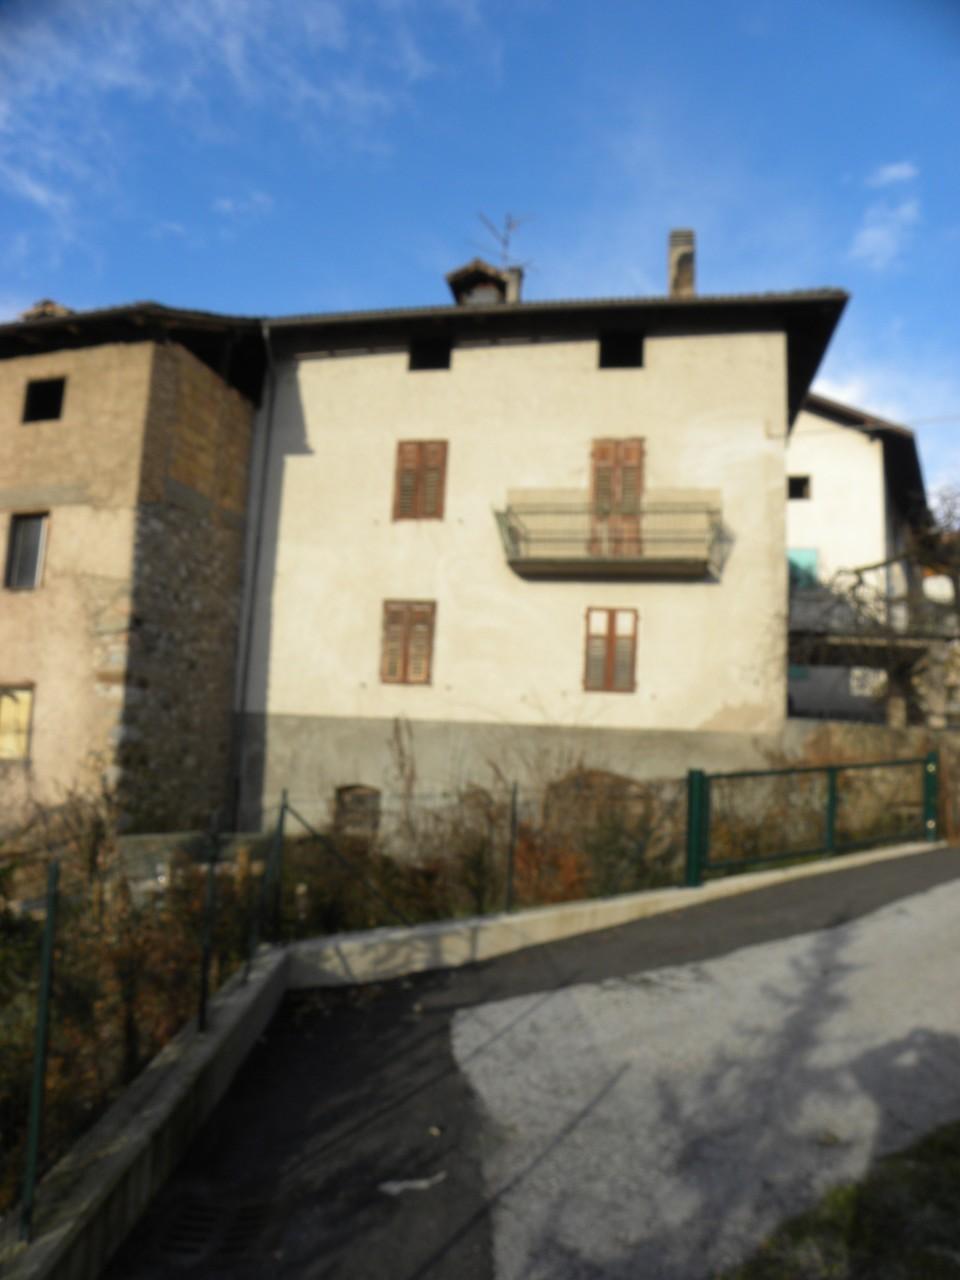 Appartamento in vendita a Ville d'Anaunia